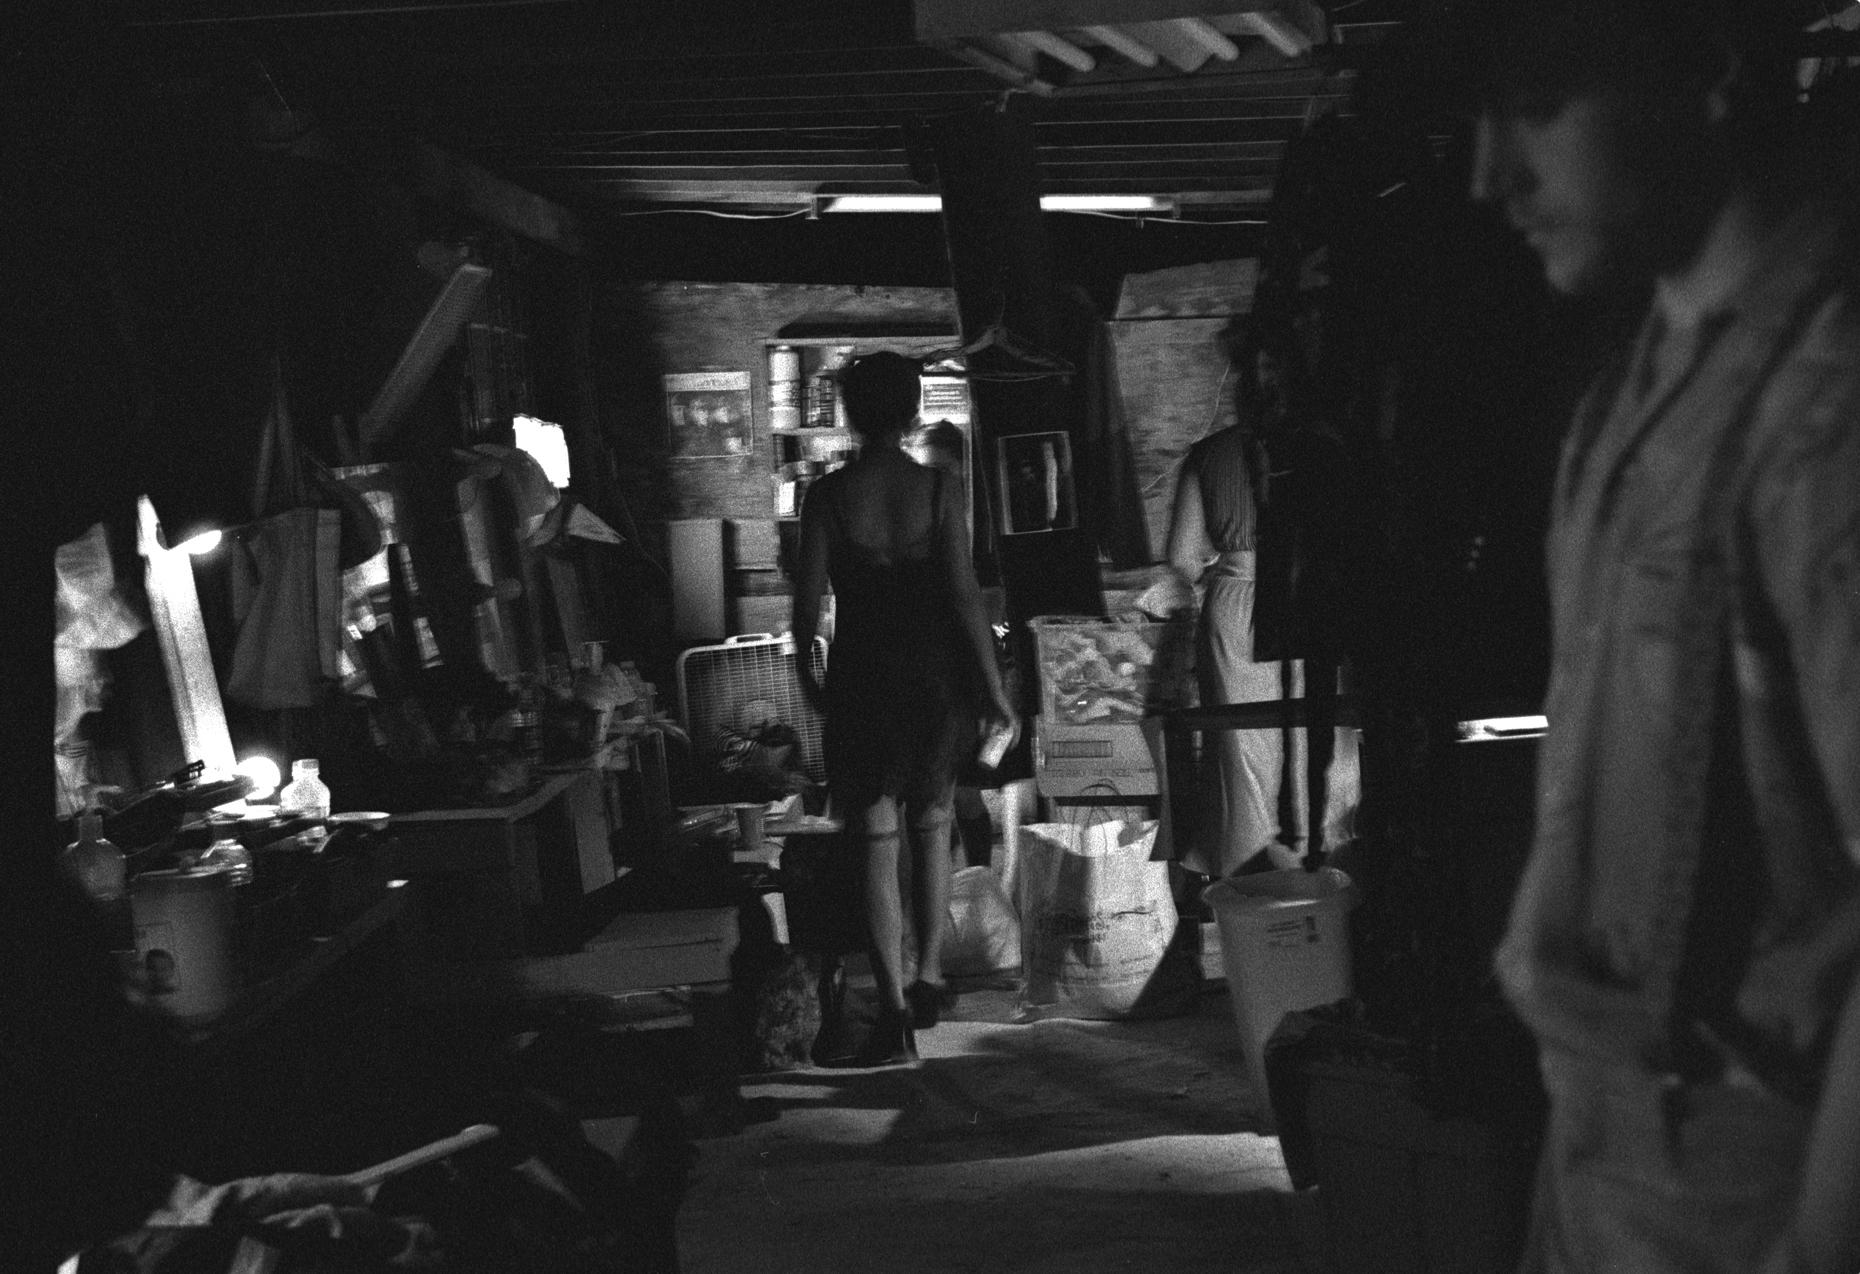 Midnight, Backstage